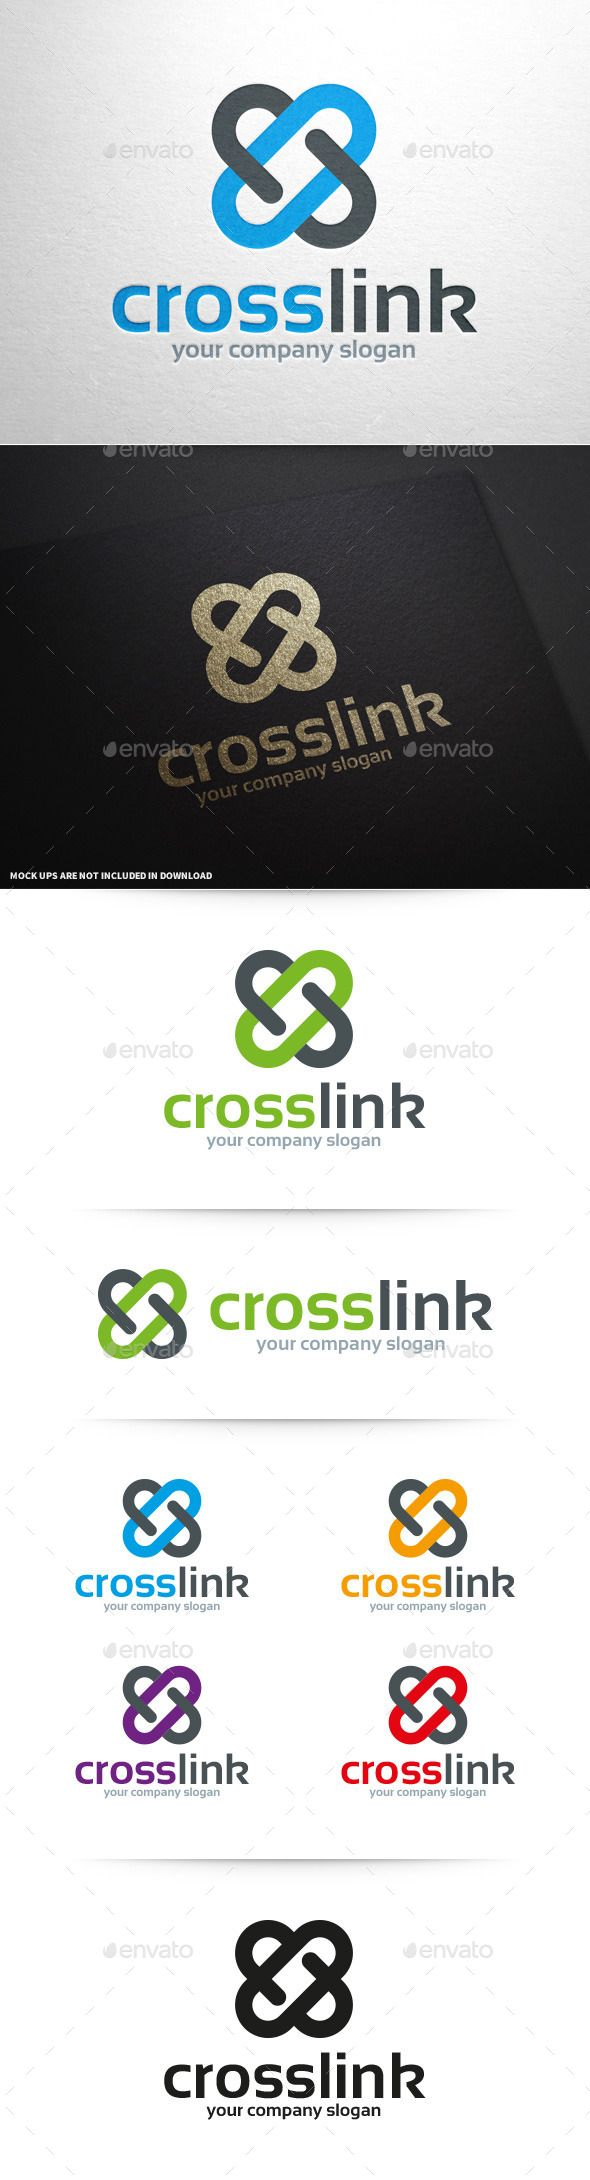 Cross Link   Logo Design Template Vector #logotype Download it here: http://graphicriver.net/item/cross-link-logo-template/10066742?s_rank=1721?ref=nexion